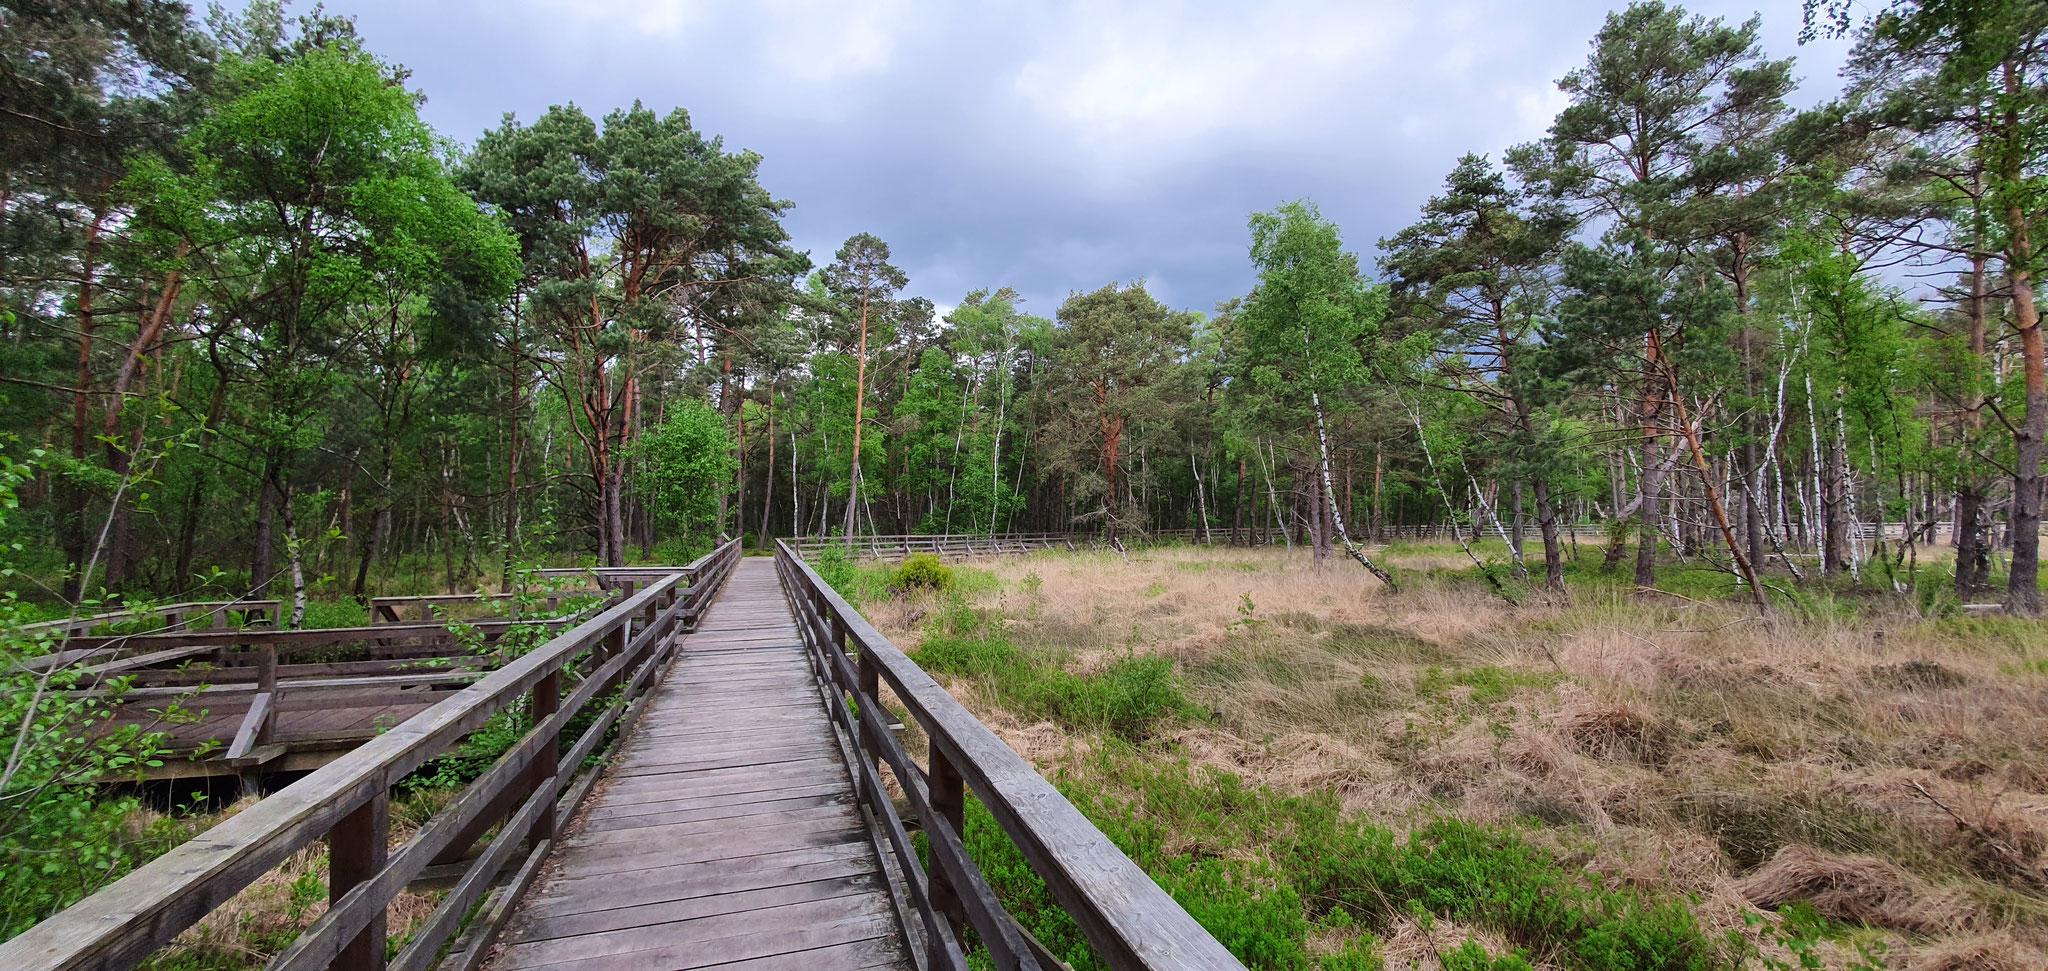 Ausblick auf den Moor-Erlebnispfad, Foto:NABU/L.Reinberger